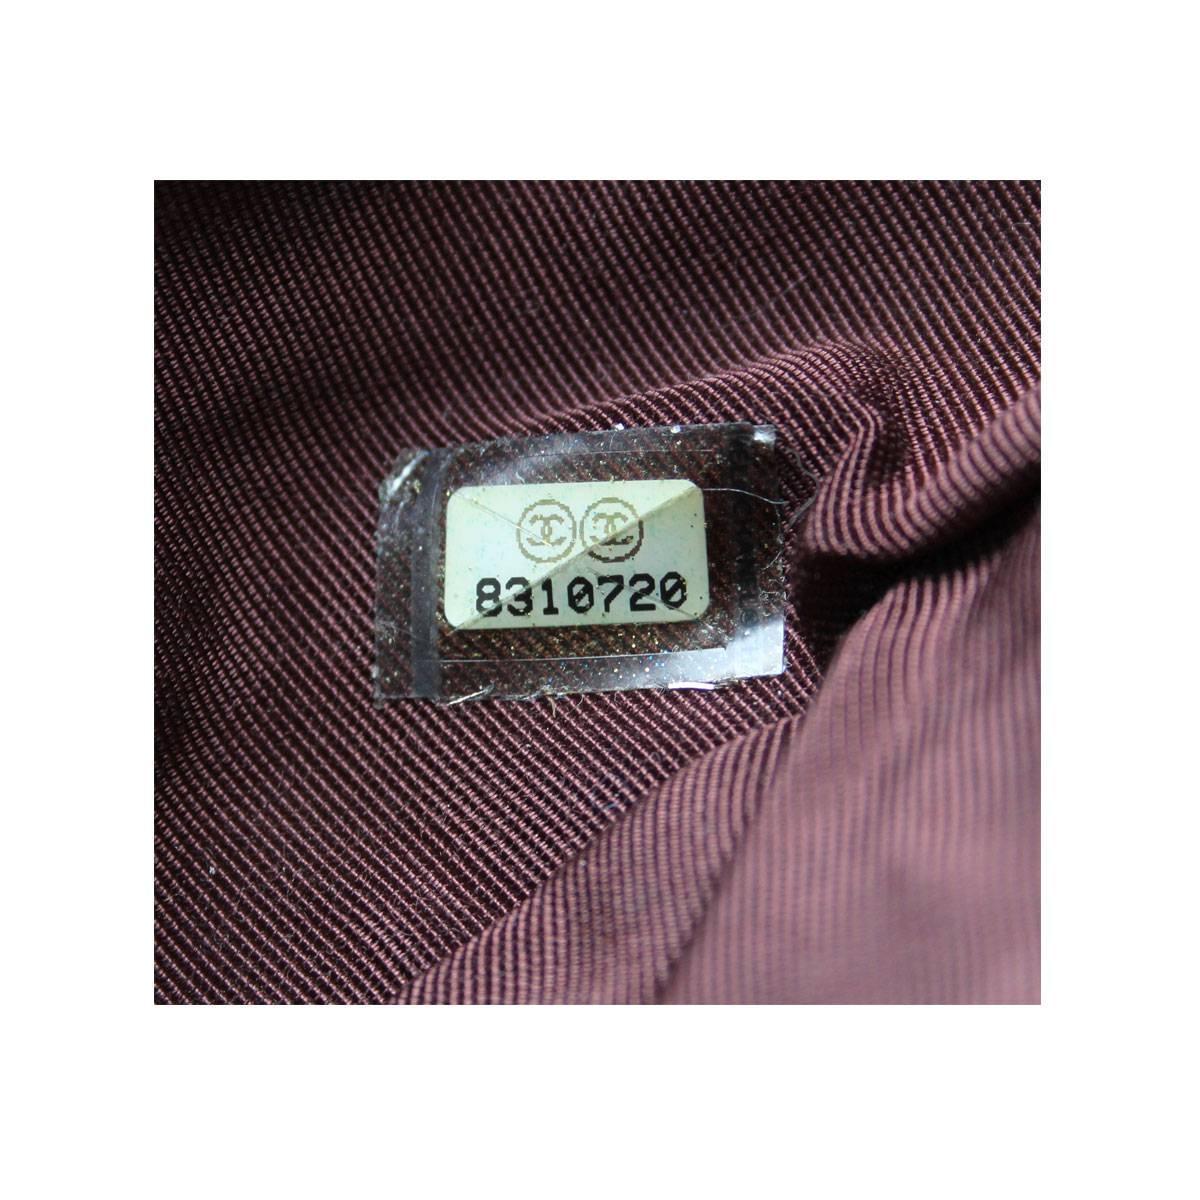 Lot 231: CHANEL CHOCOLATE BAR FLAP SHOULDER BAG, date code for 2000-02 ...